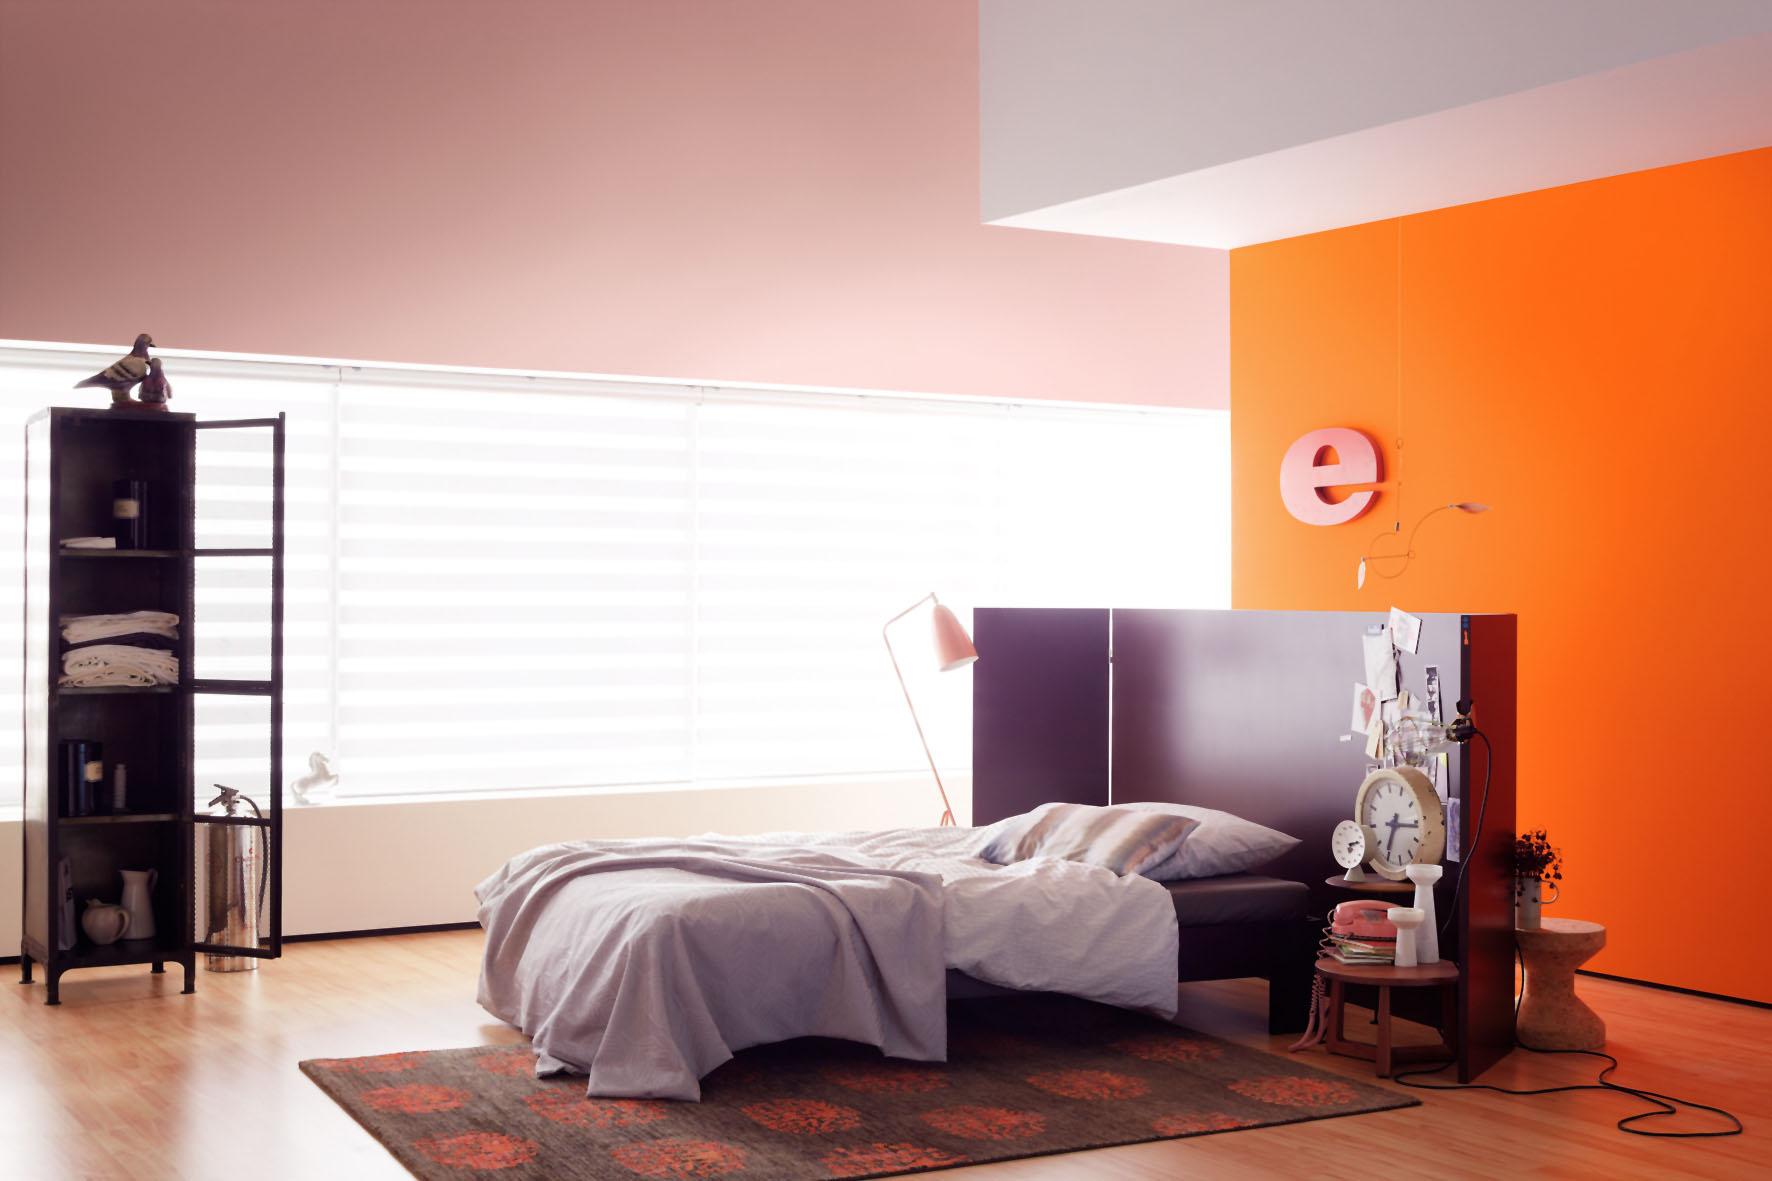 mehr mut zur farbe malerfirma m hle panketal. Black Bedroom Furniture Sets. Home Design Ideas